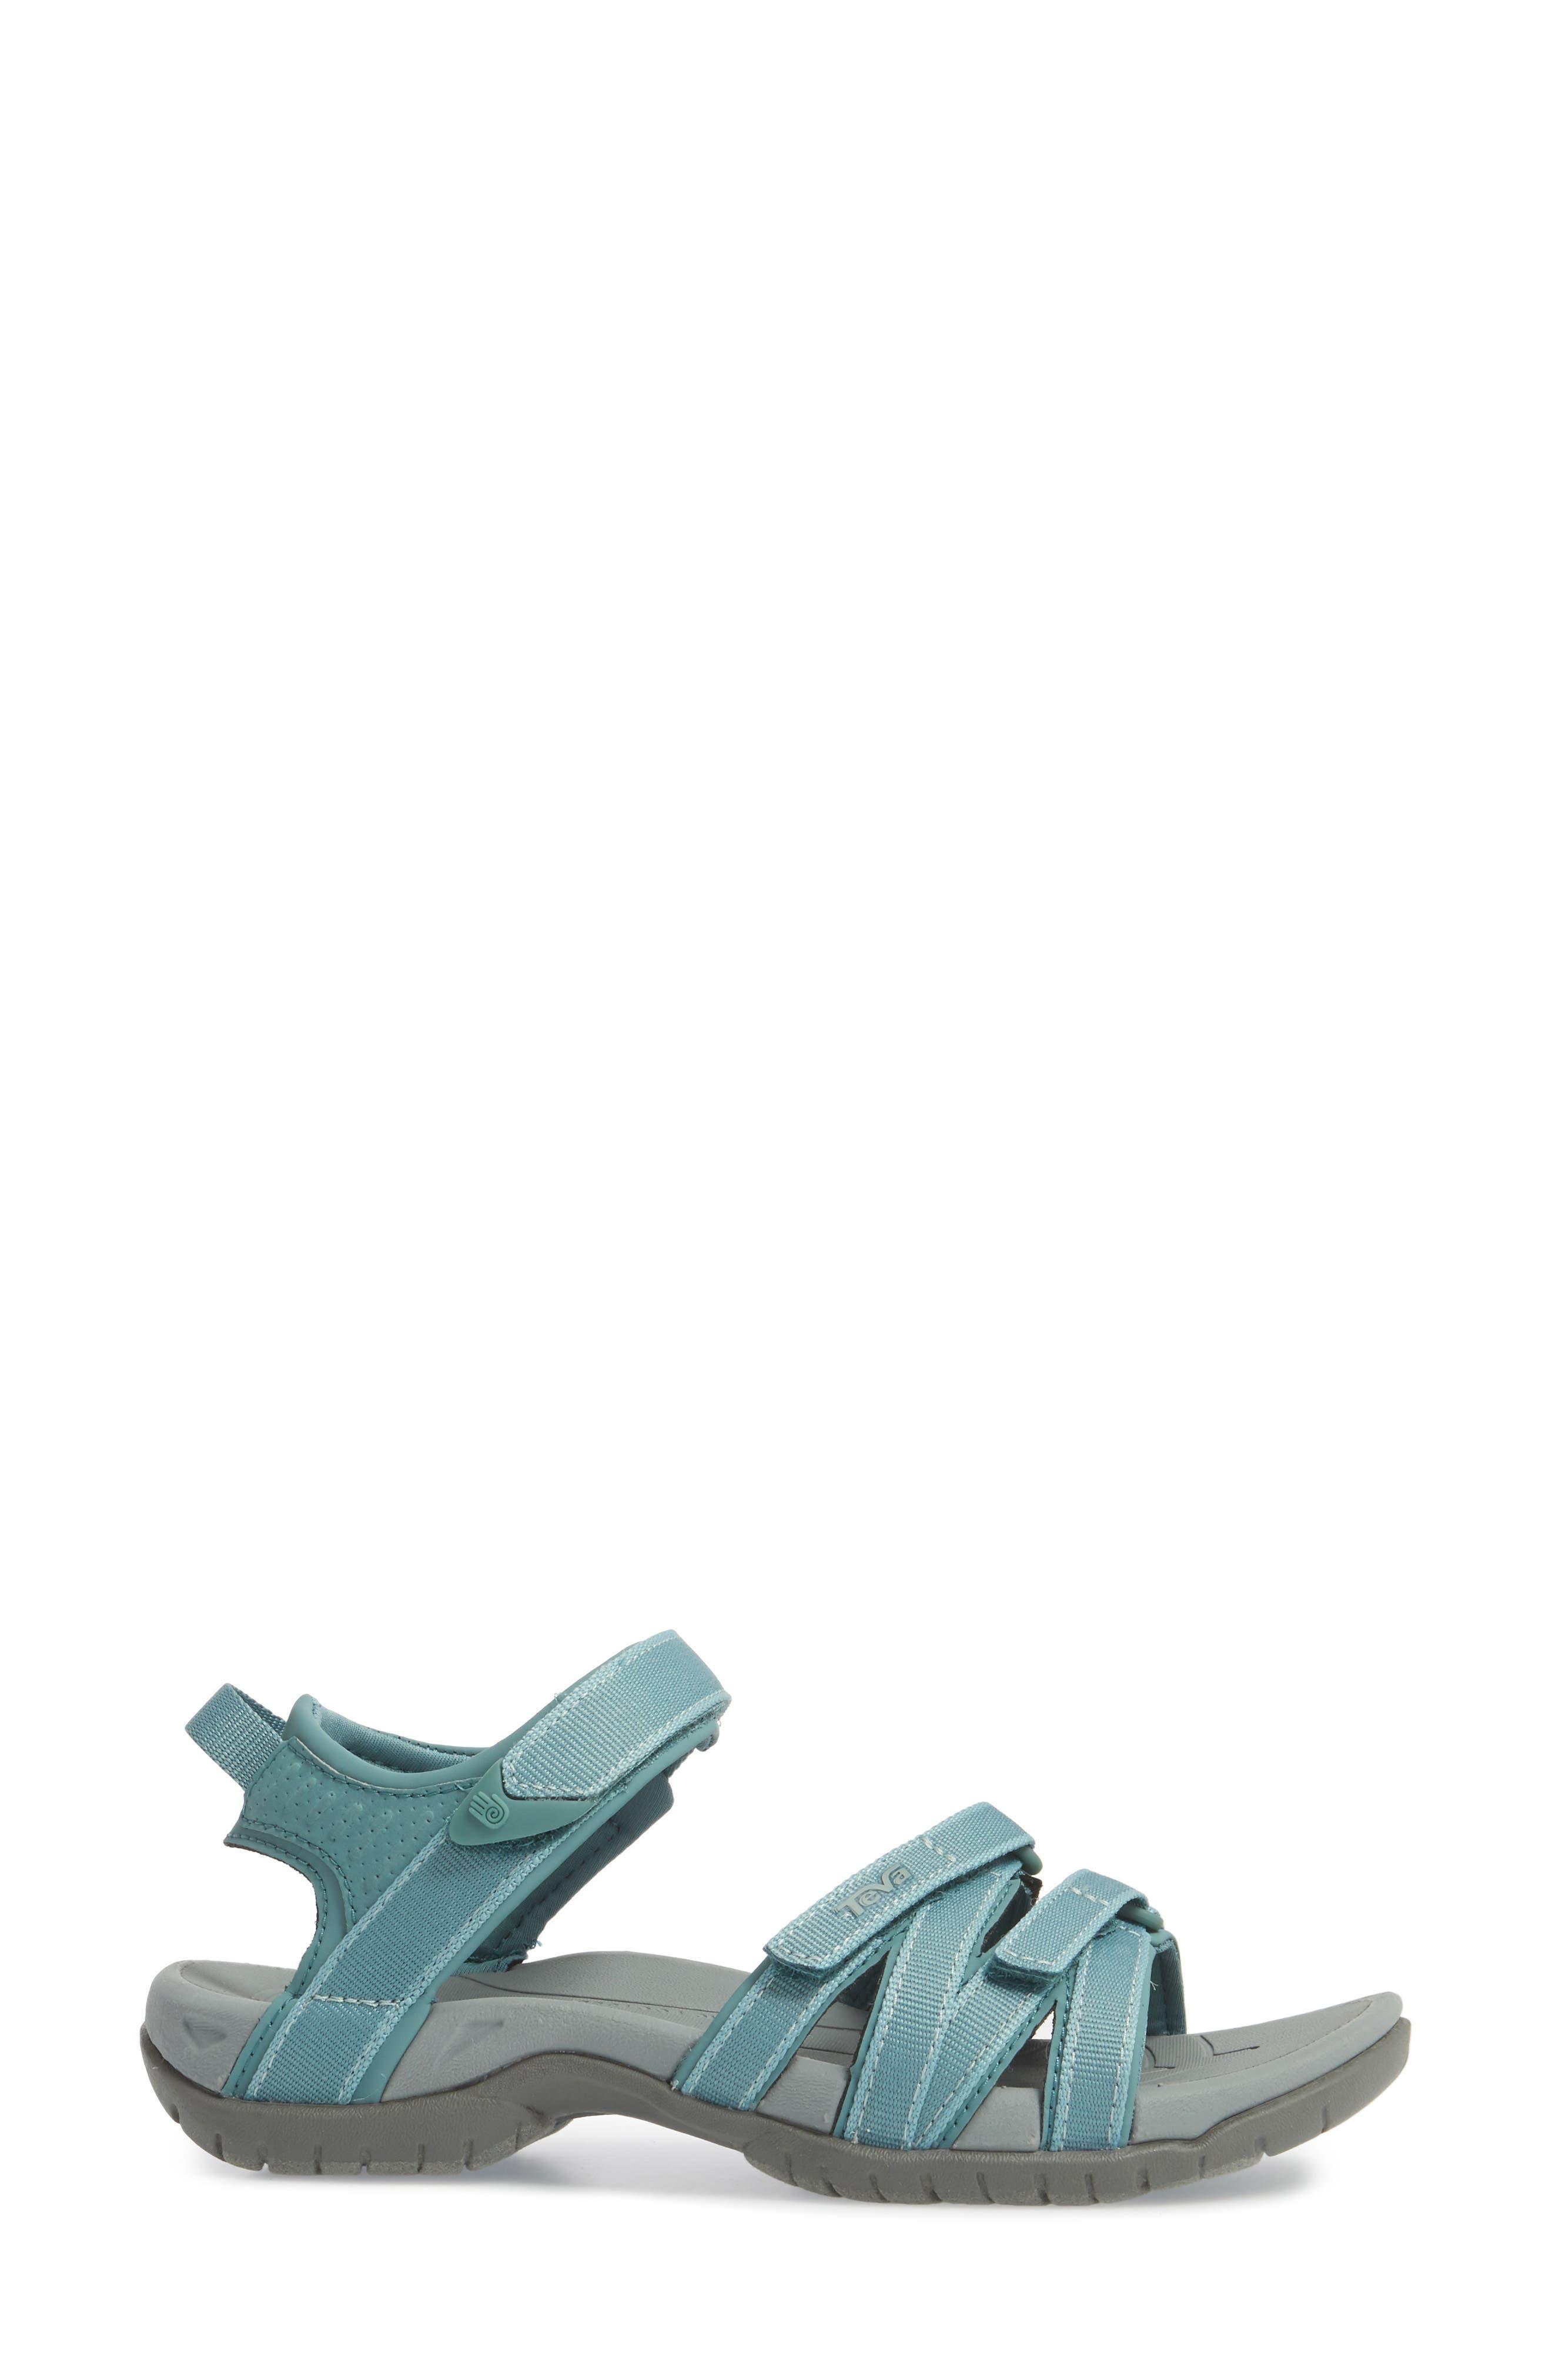 'Tirra' Sandal,                             Alternate thumbnail 3, color,                             NORTH ATLANTIC